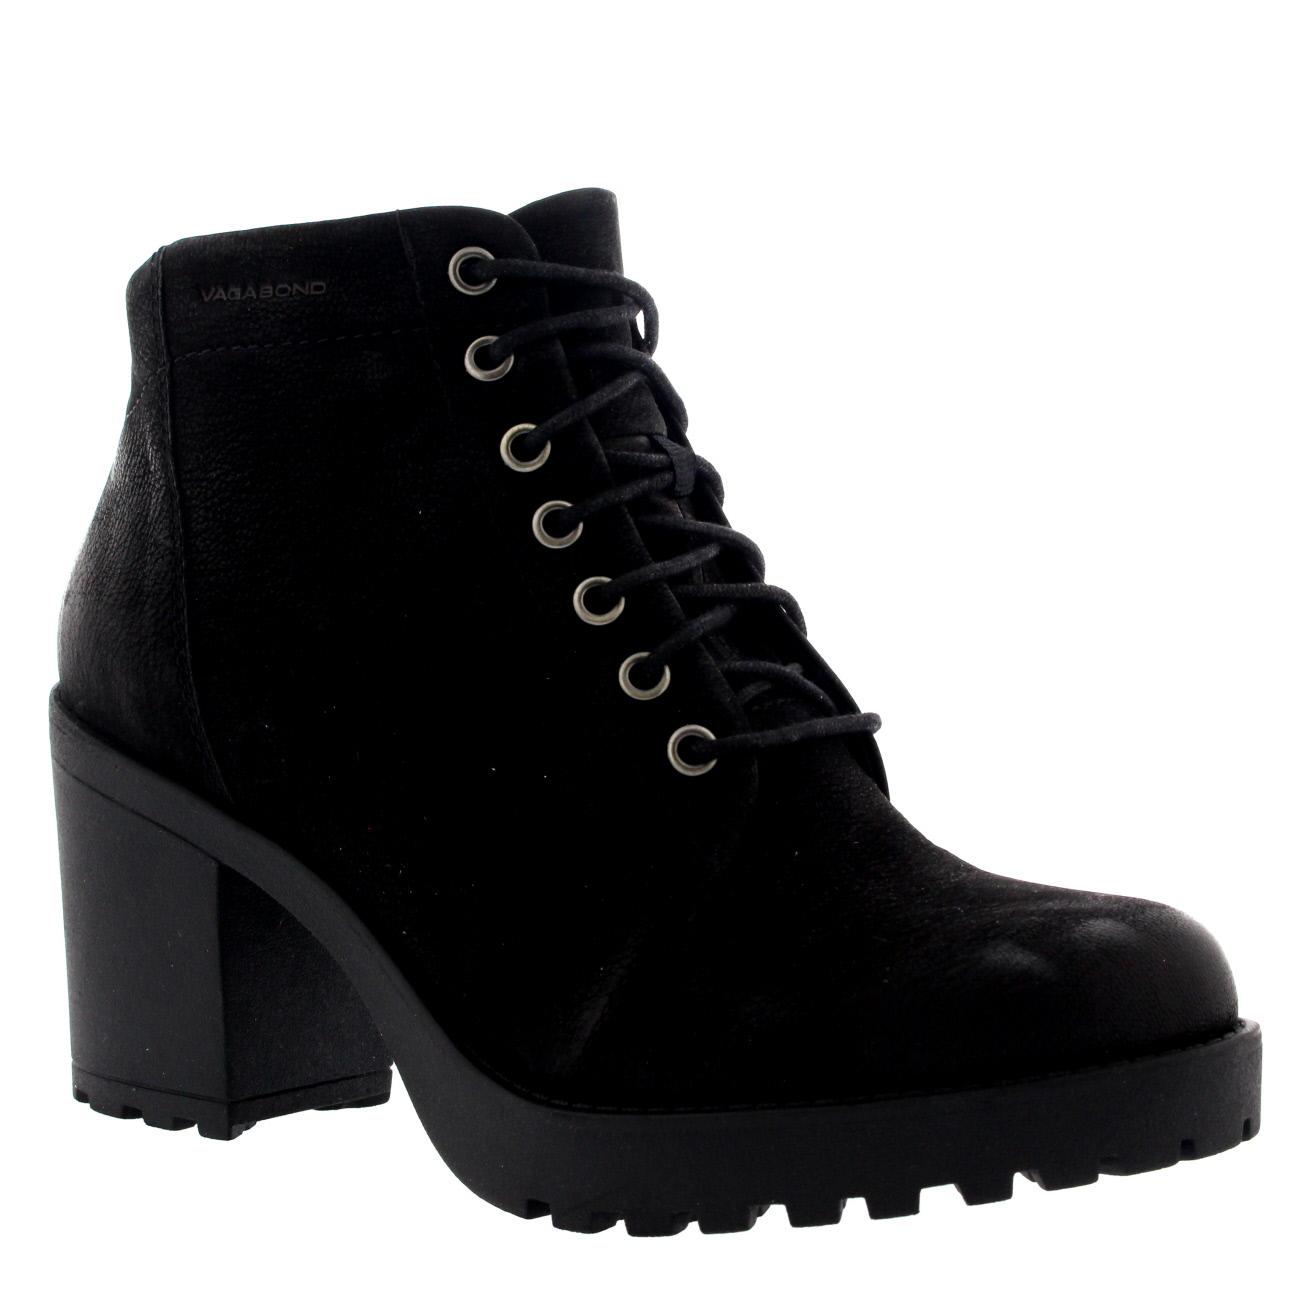 Vagabond Grace Mid Heel Ankle Boots